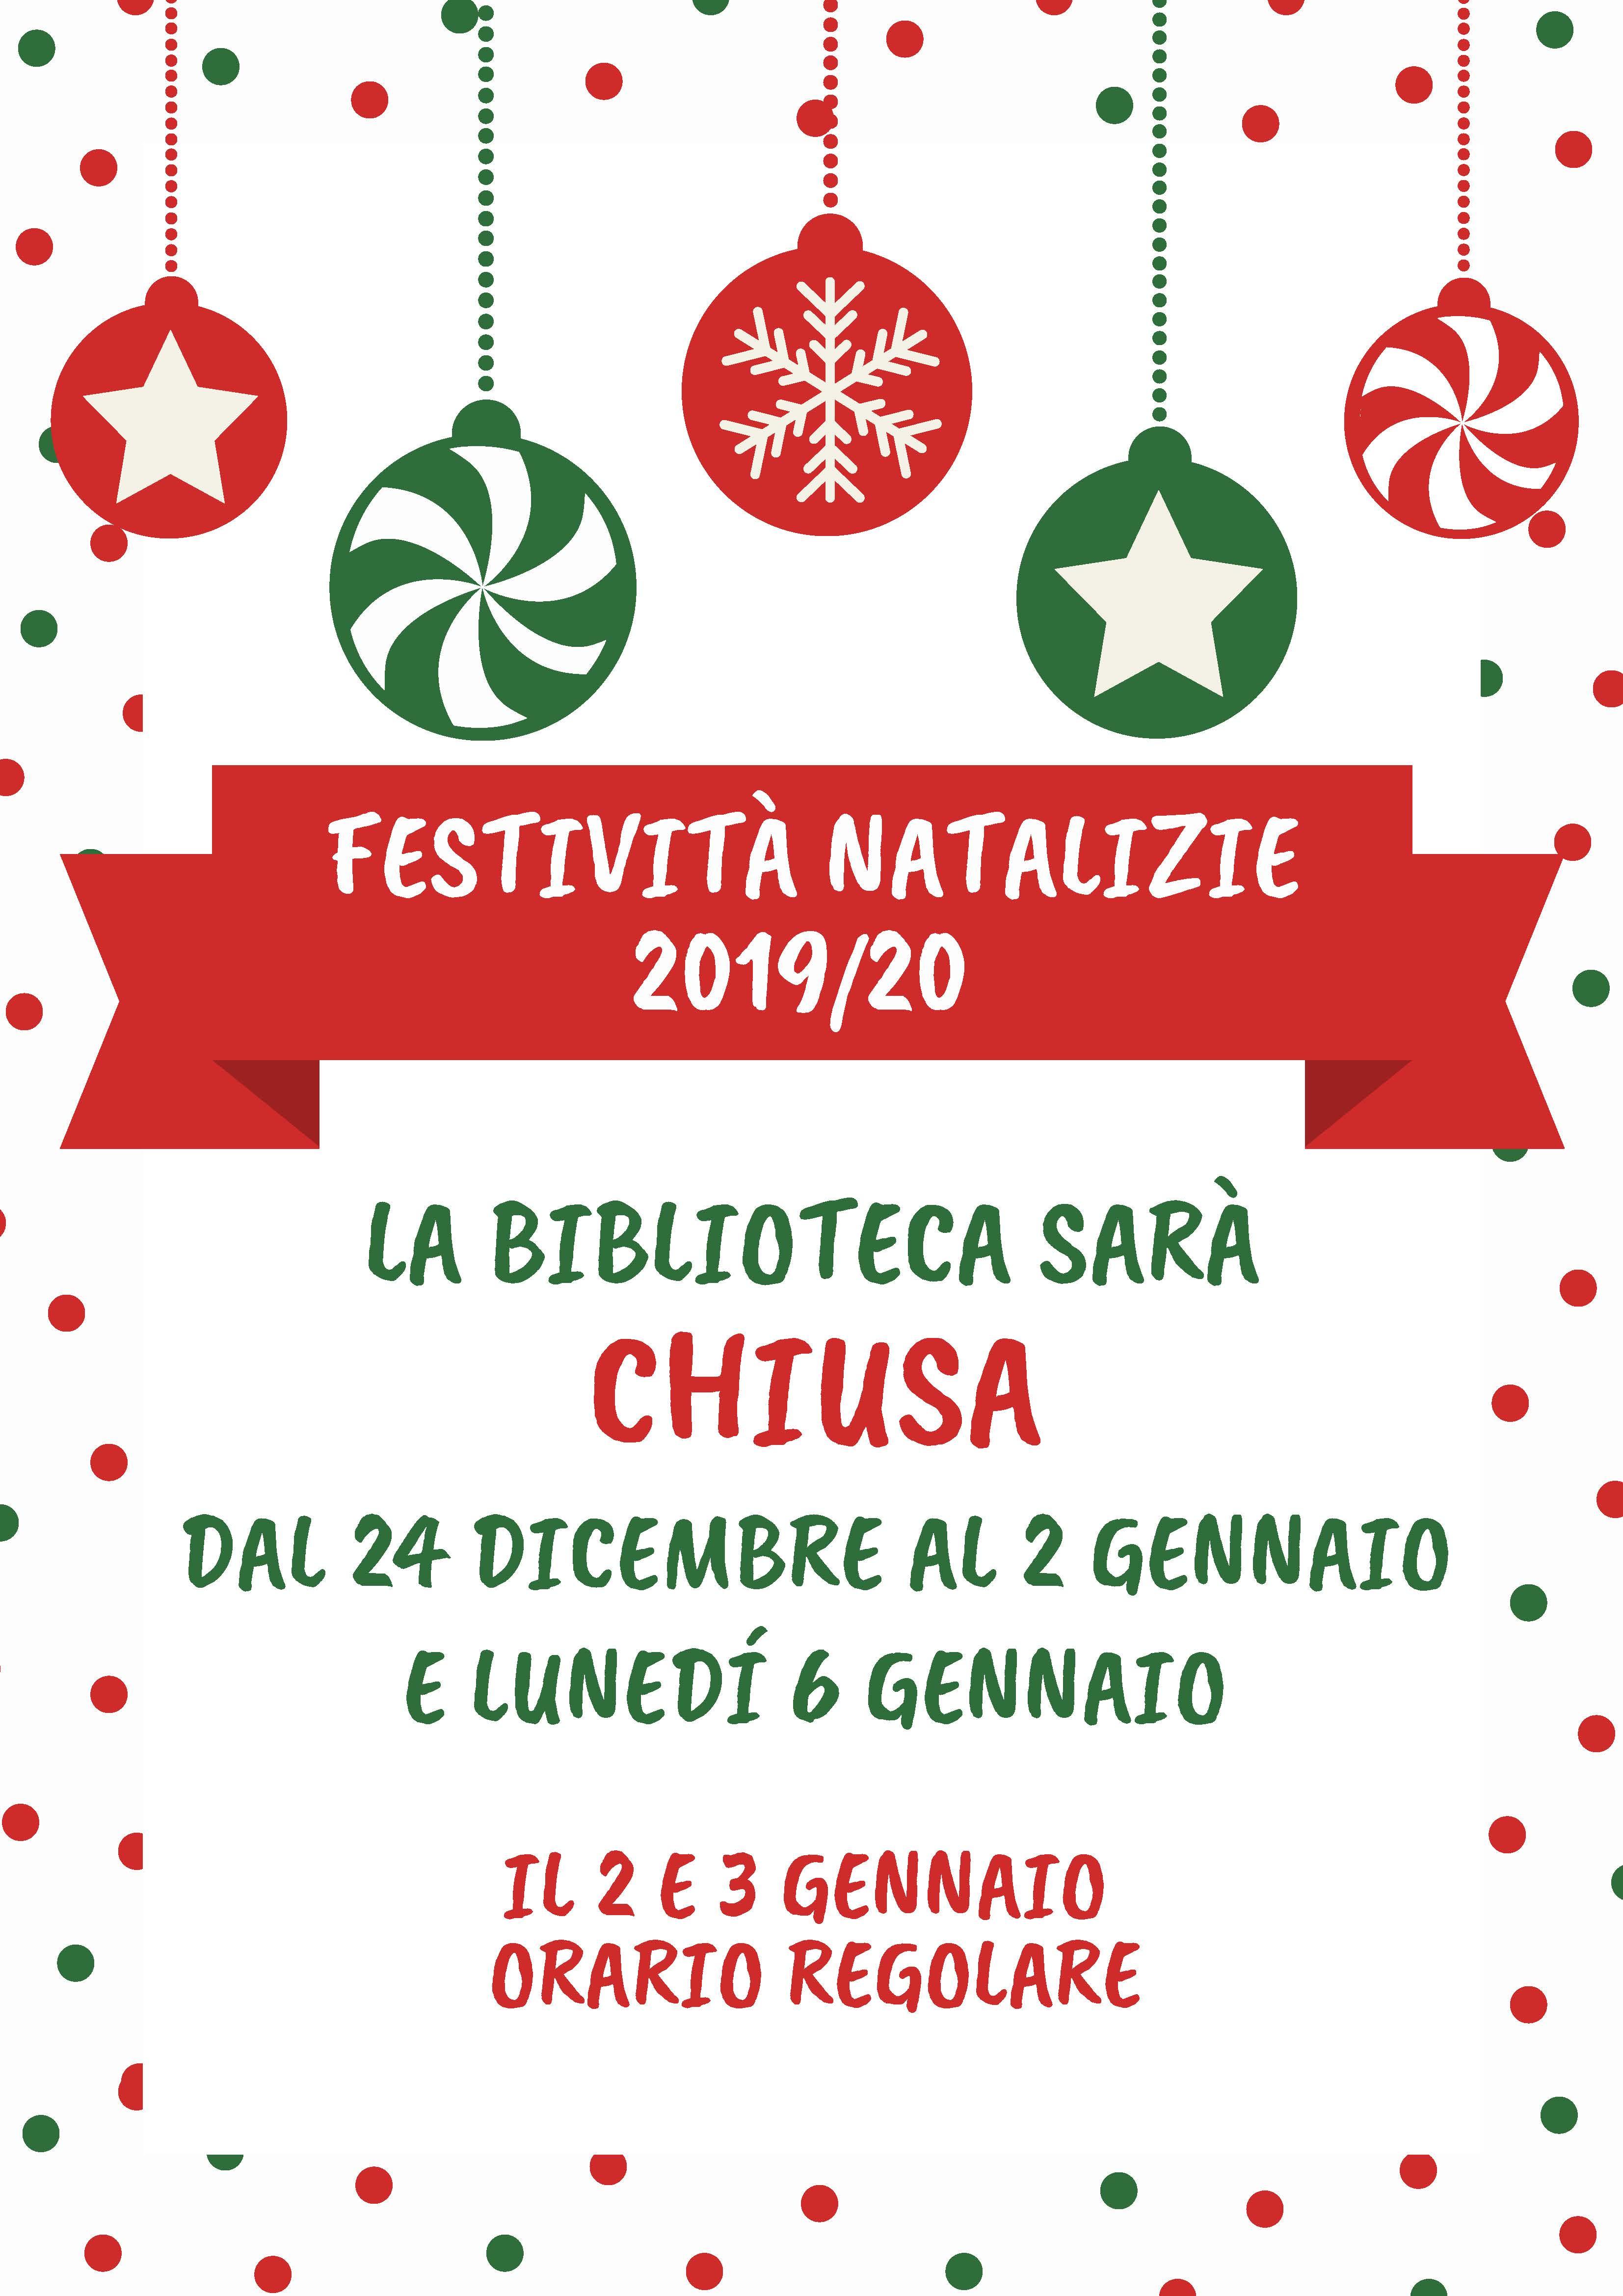 AVVISO CHIUSURA BIBLIOTECA COMUNALE  – festività natalizie